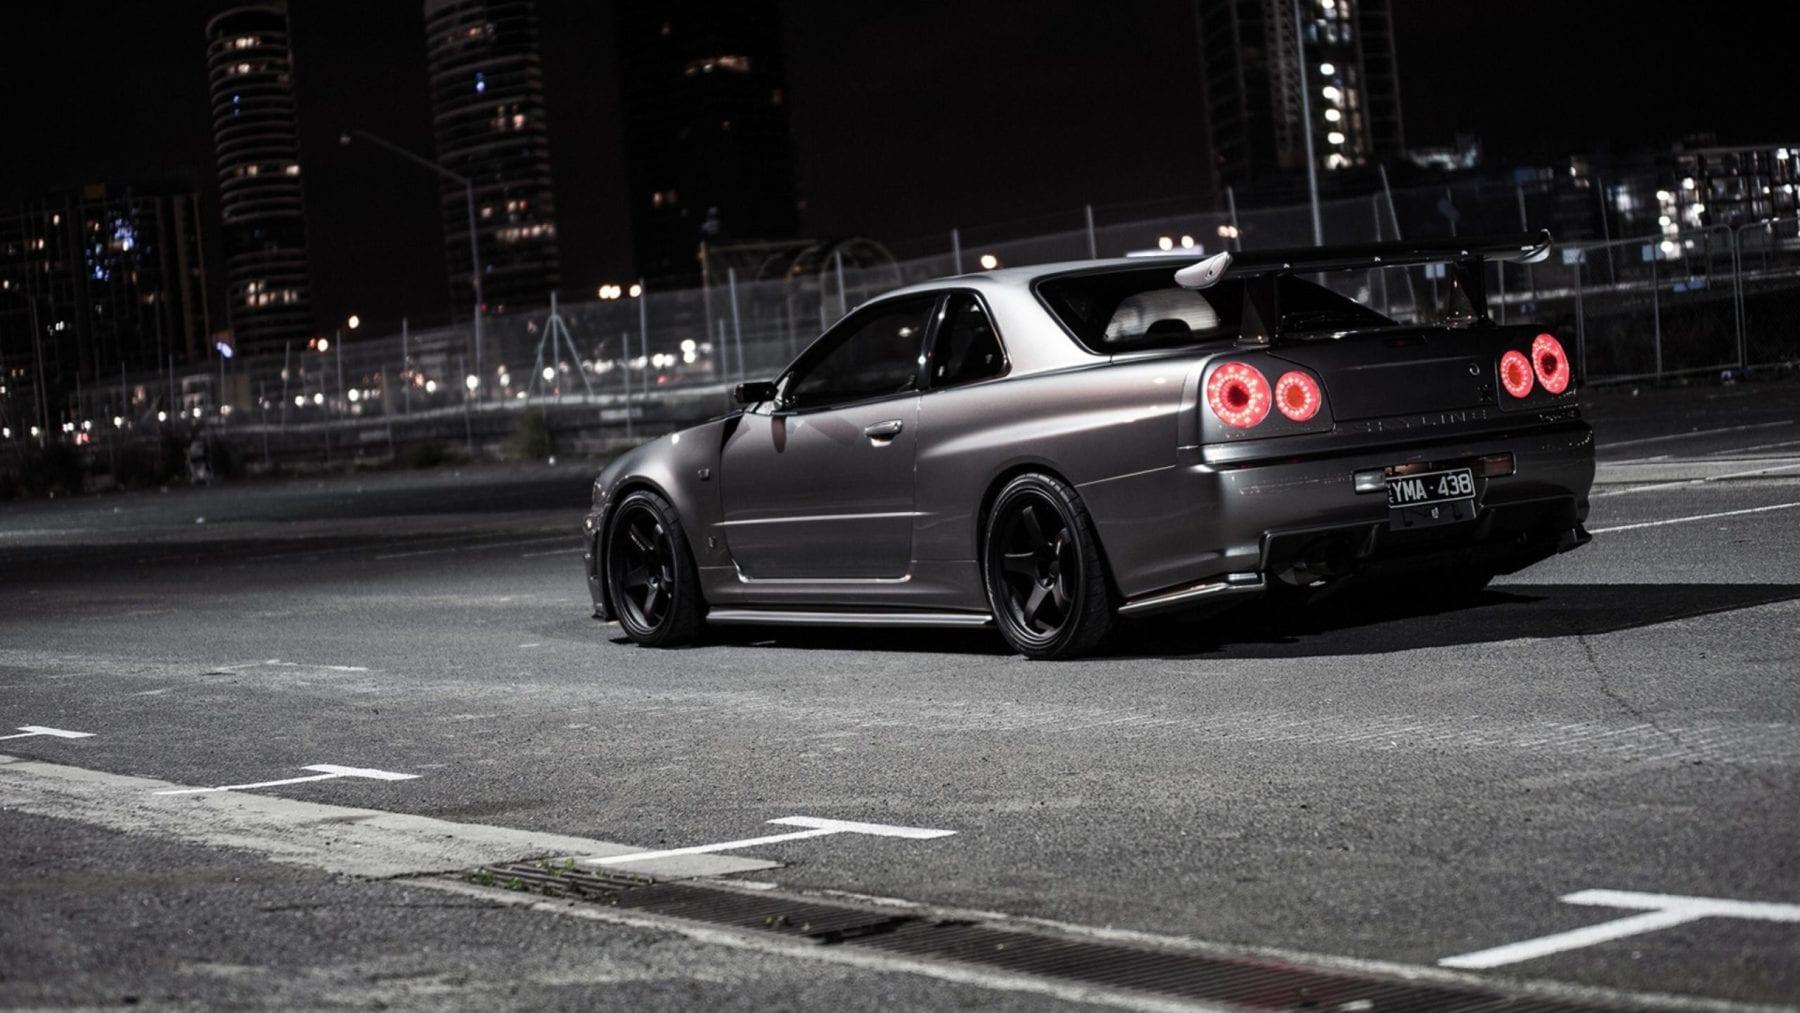 Nissan Skyline GTR 32